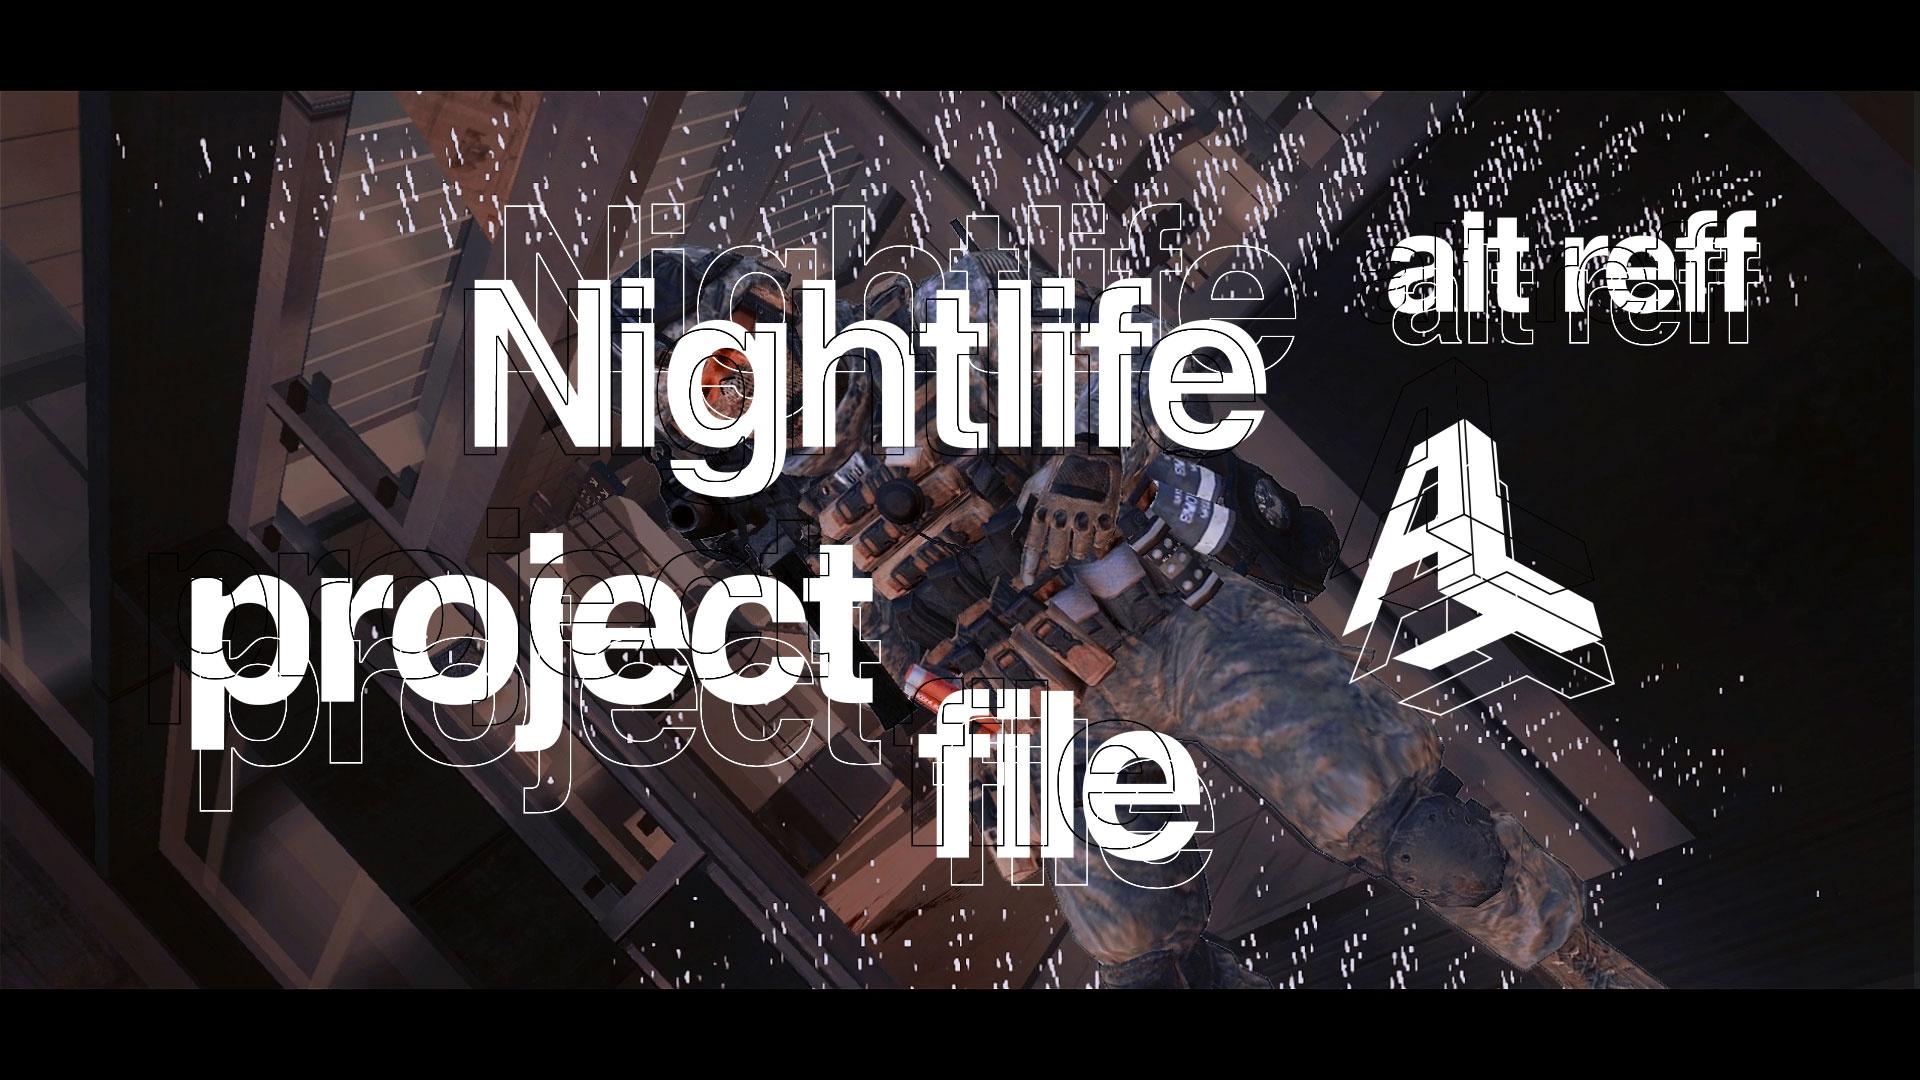 Nightlife (ft. alt reff)